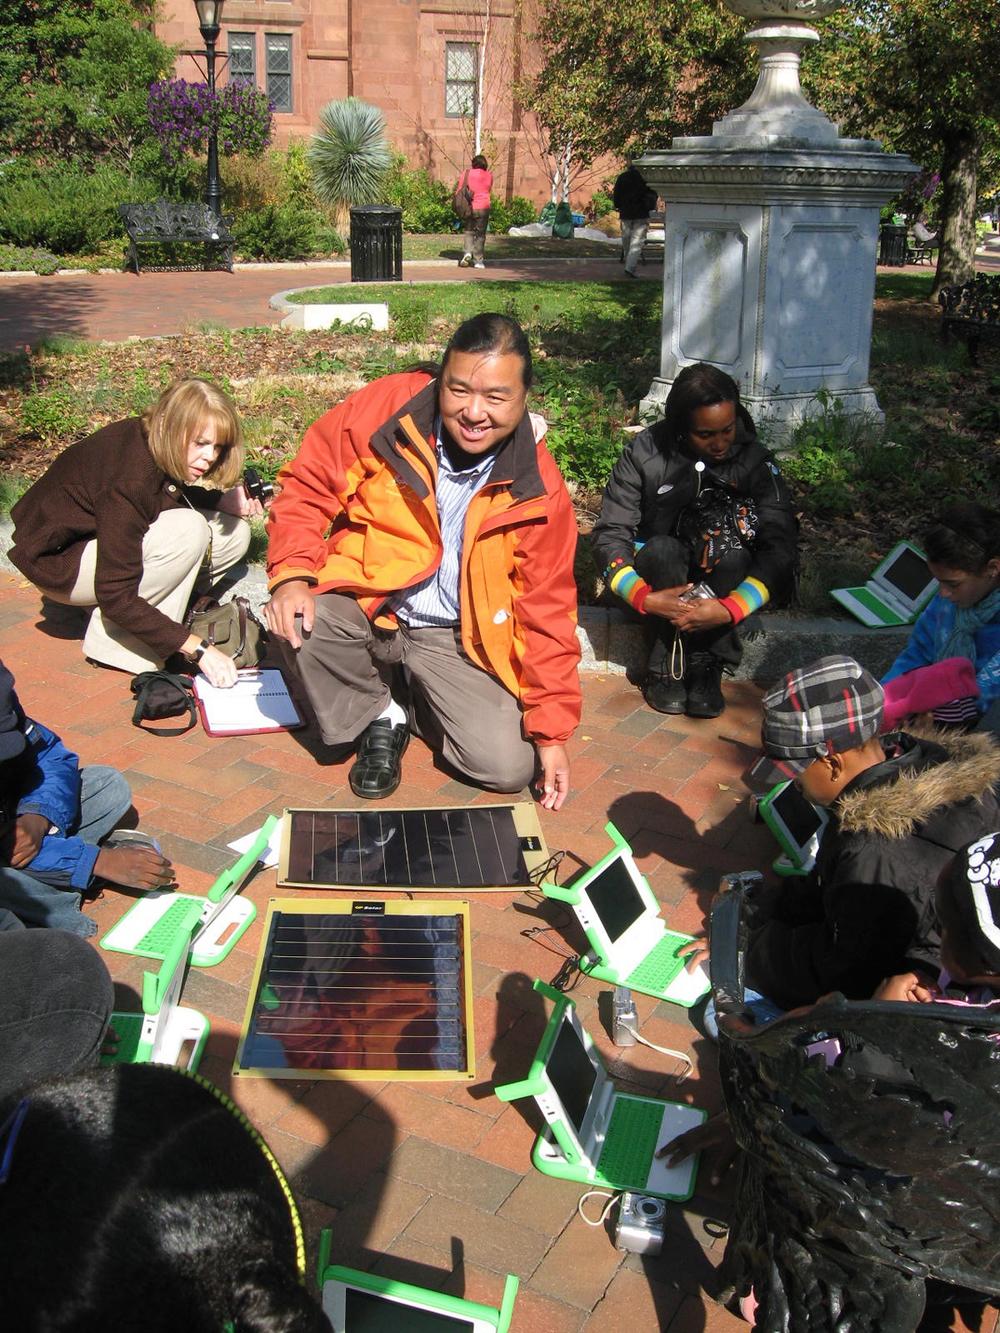 Mike Lee demonstrates solar panels. Photo: ©2010 Joanne Miller